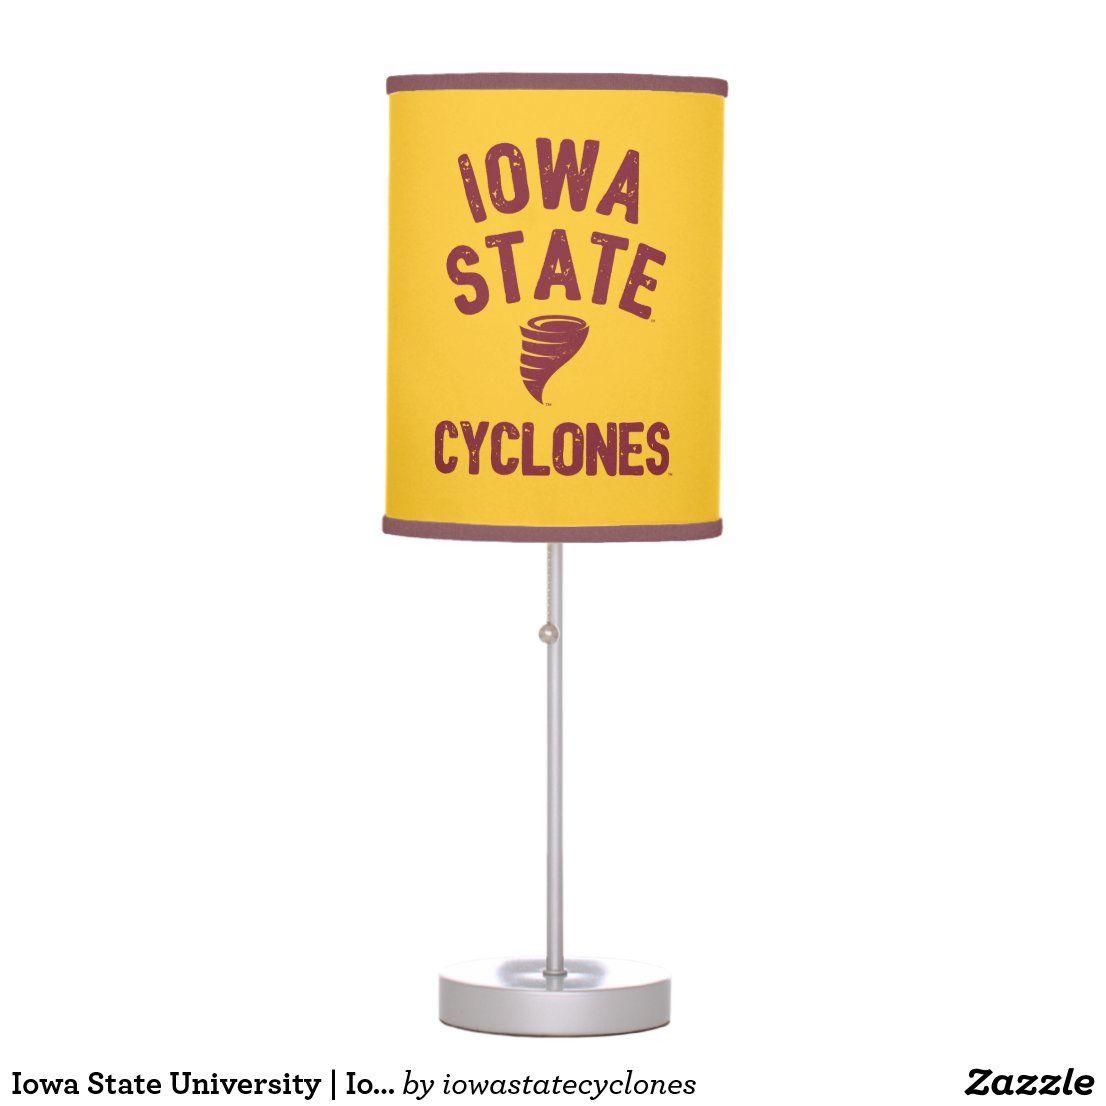 Iowa State University | Iowa Cyclone Distressed Table Lamp | Zazzle.com